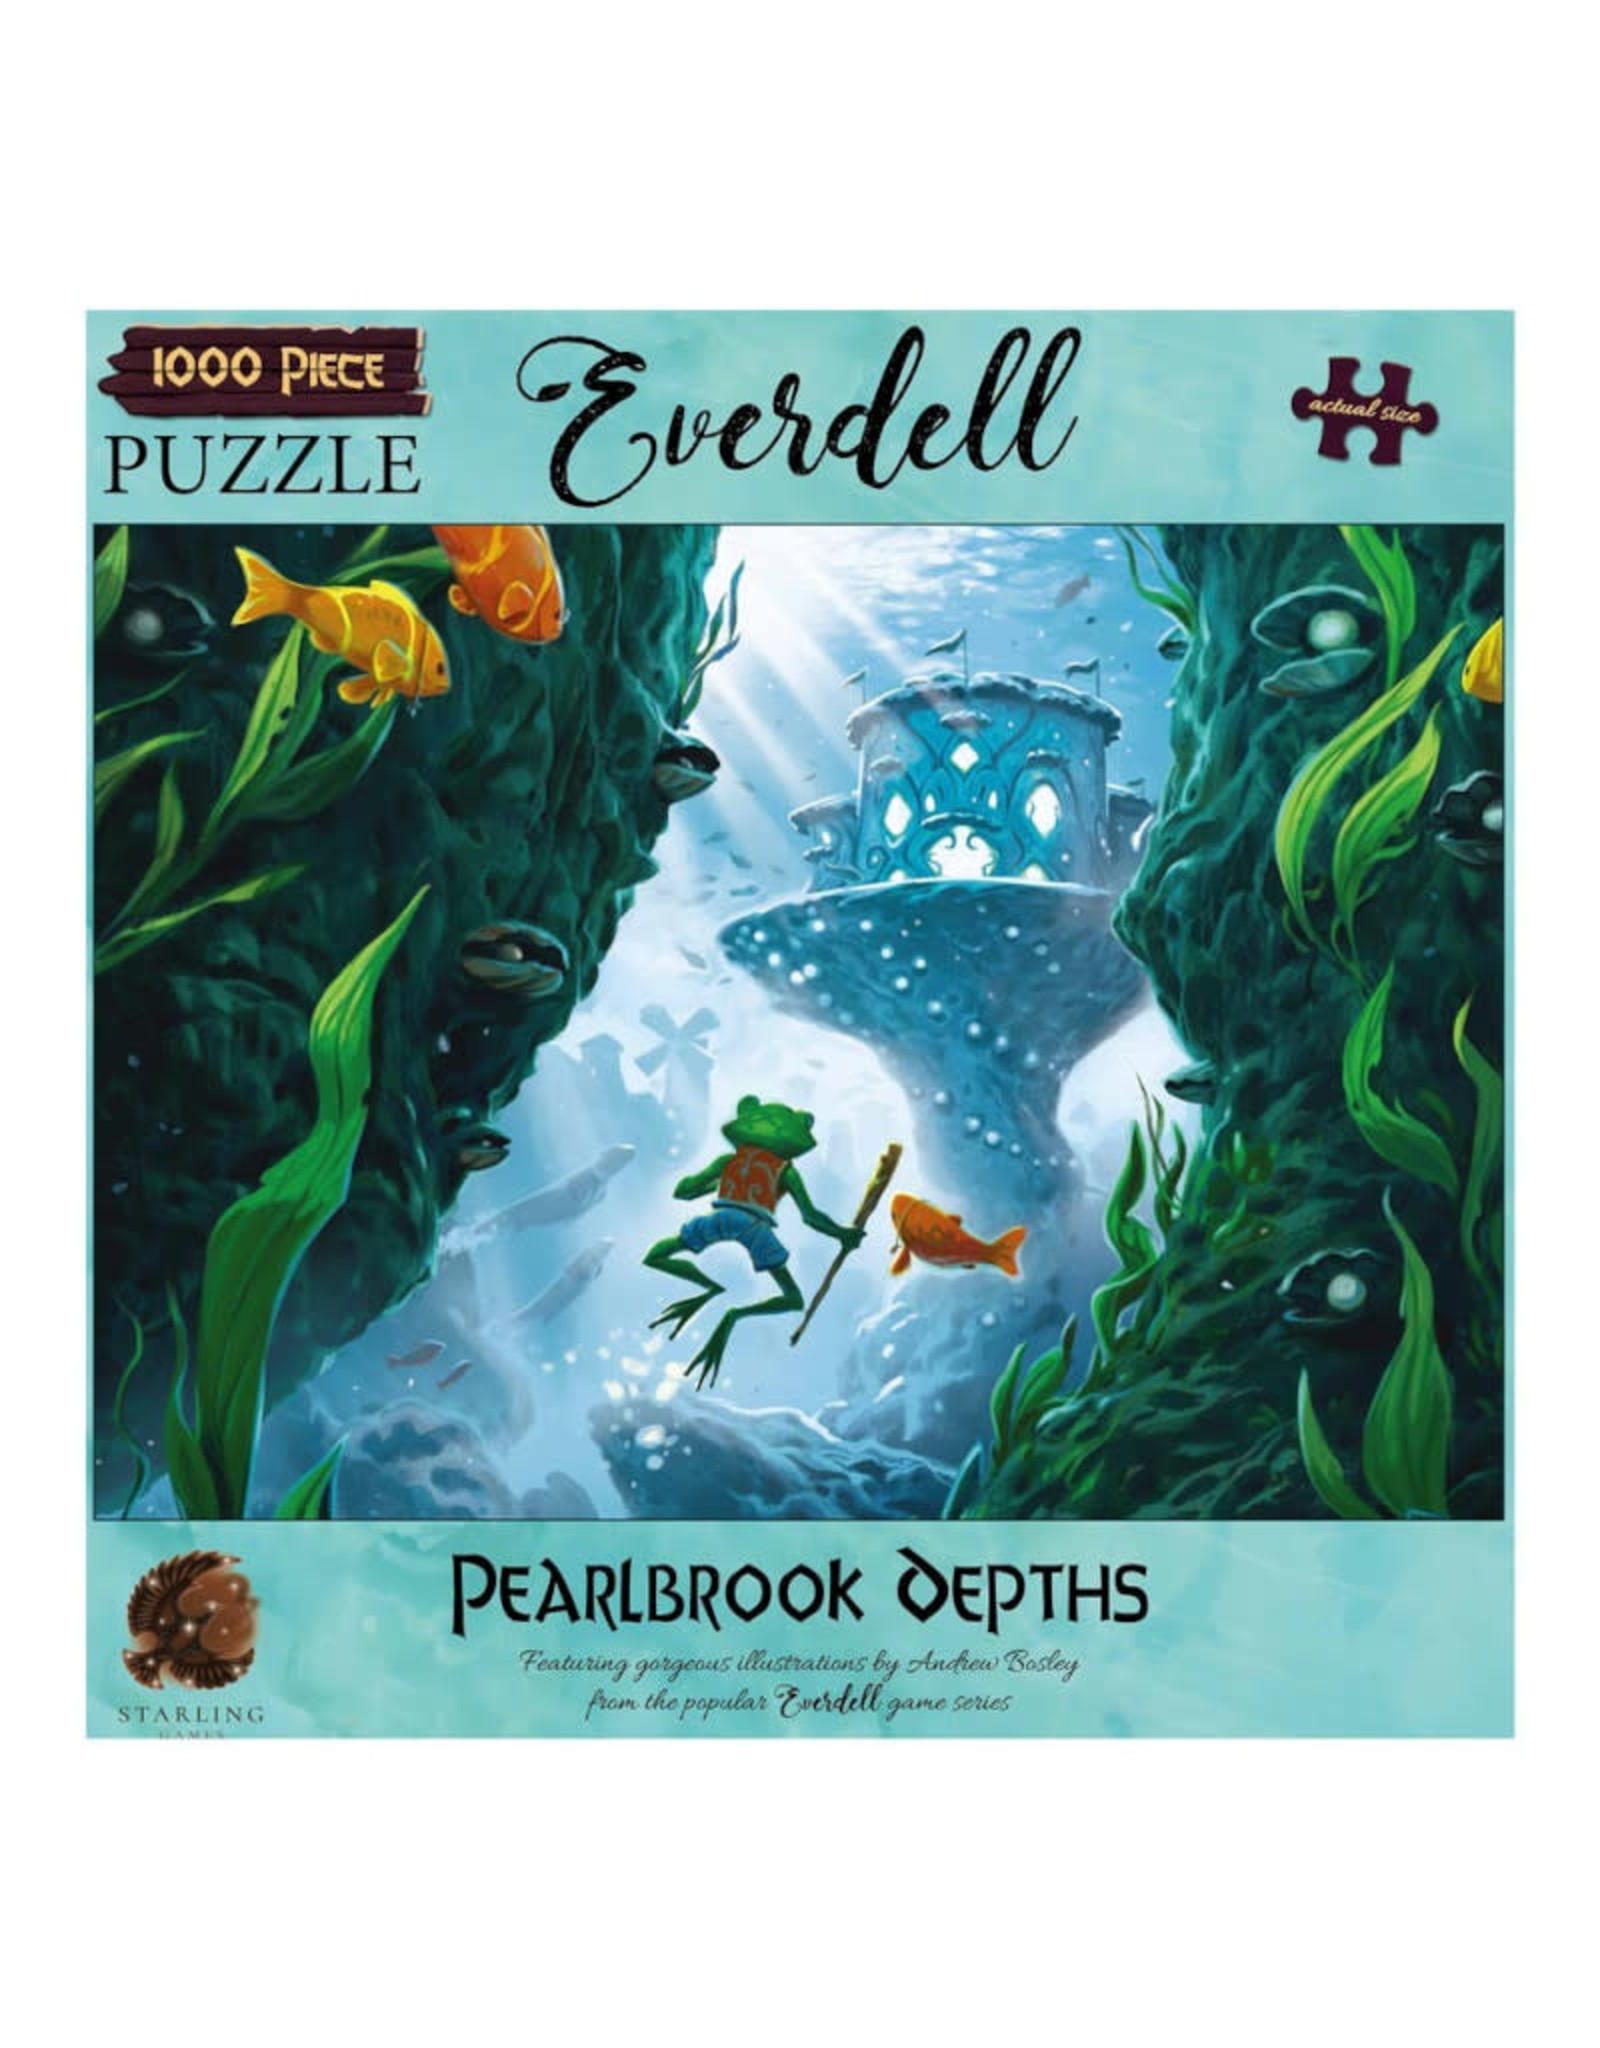 Everdell Pearlbook Depths Puzzle 1000 PCS